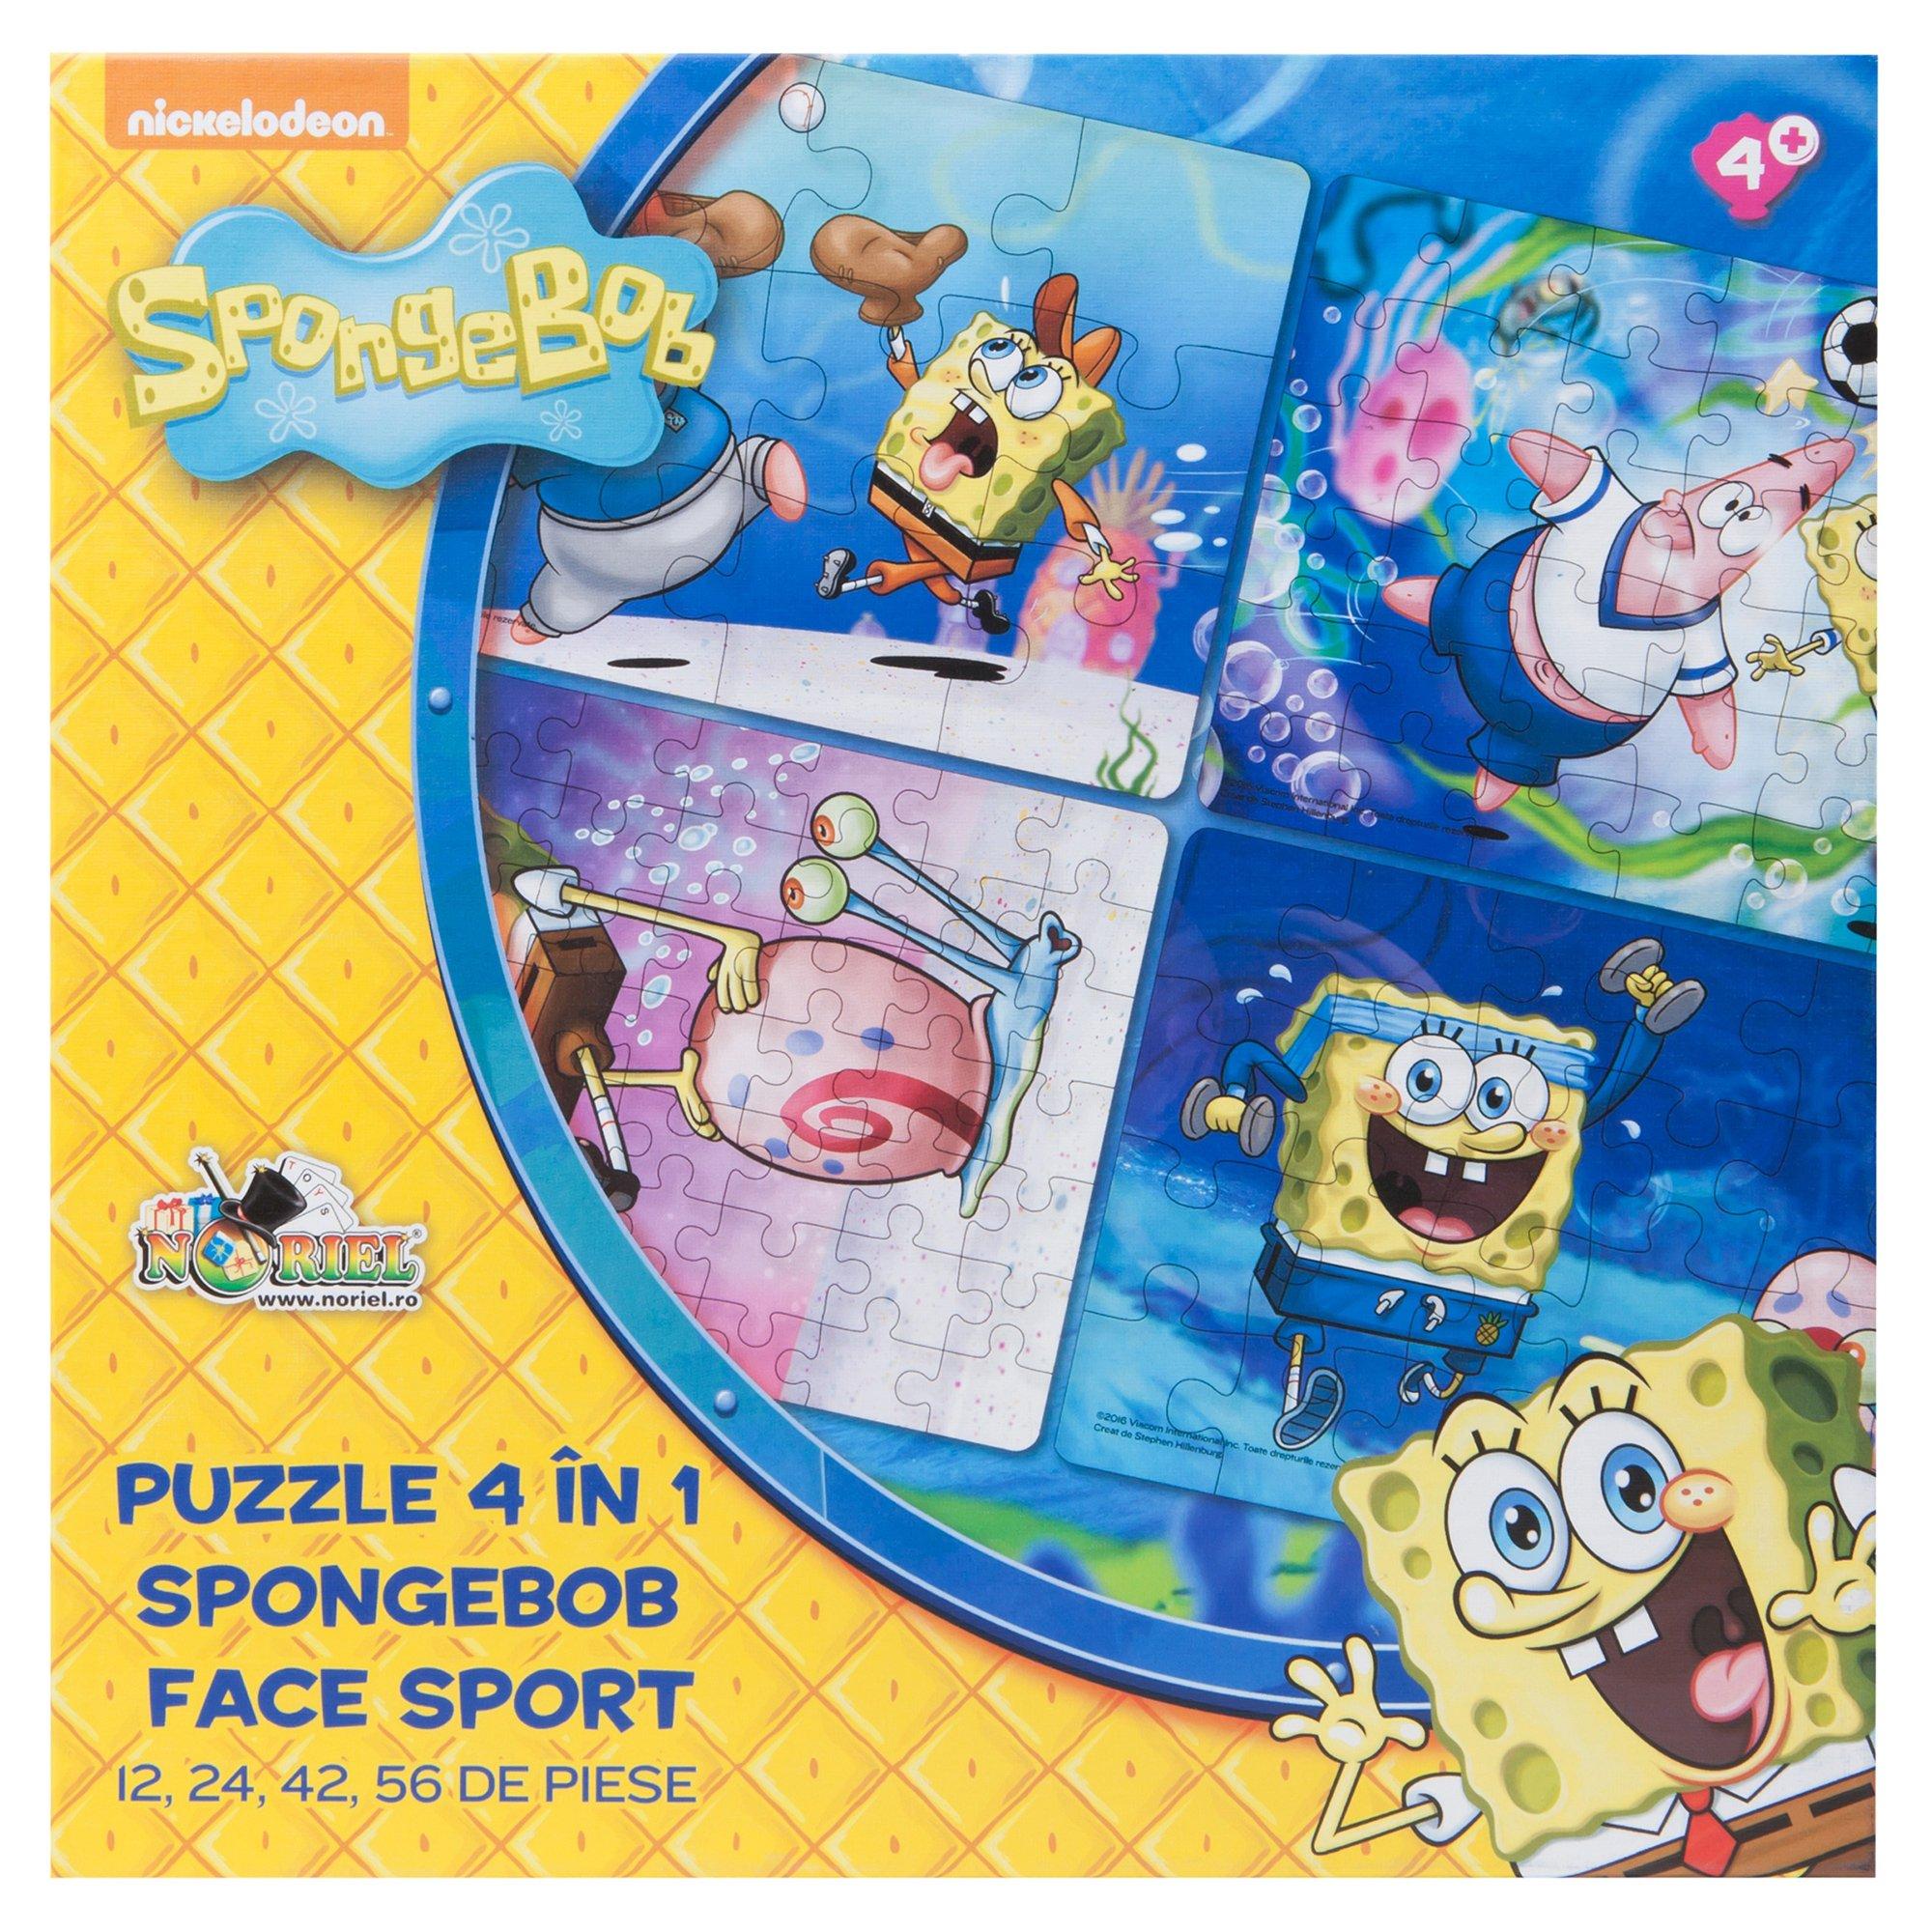 puzzle 4 in 1 spongebob - spongebob face sport (12, 24, 42, 56 piese)